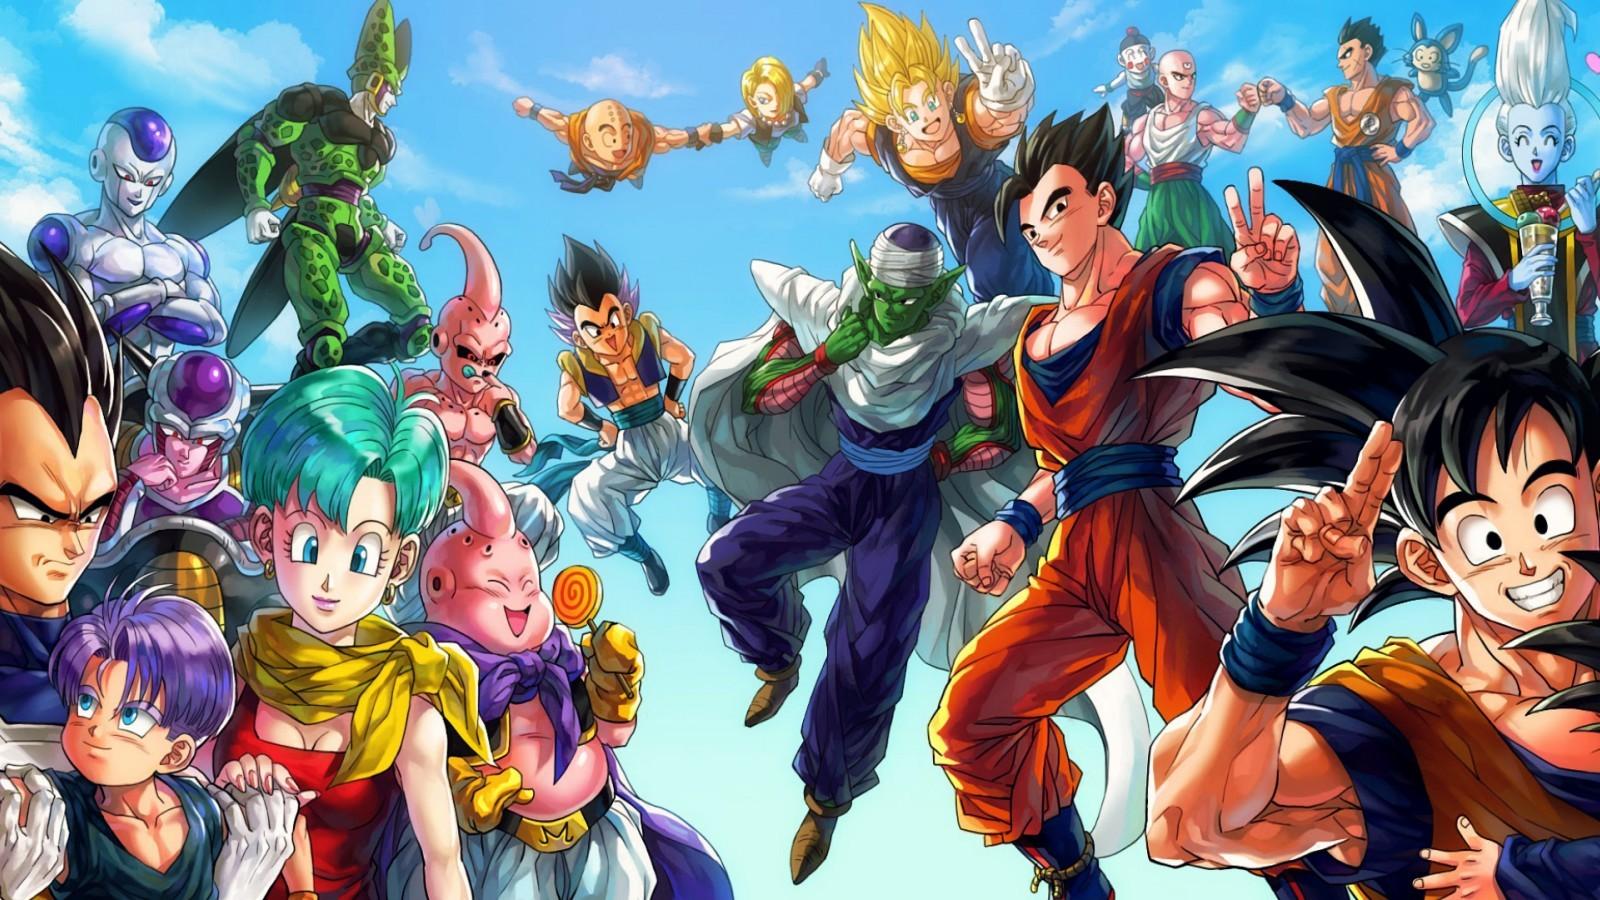 Fond d'écran : illustration, Anime, Dragon Ball, Son Goku, Dragon Ball Z, des bandes dessinées ...